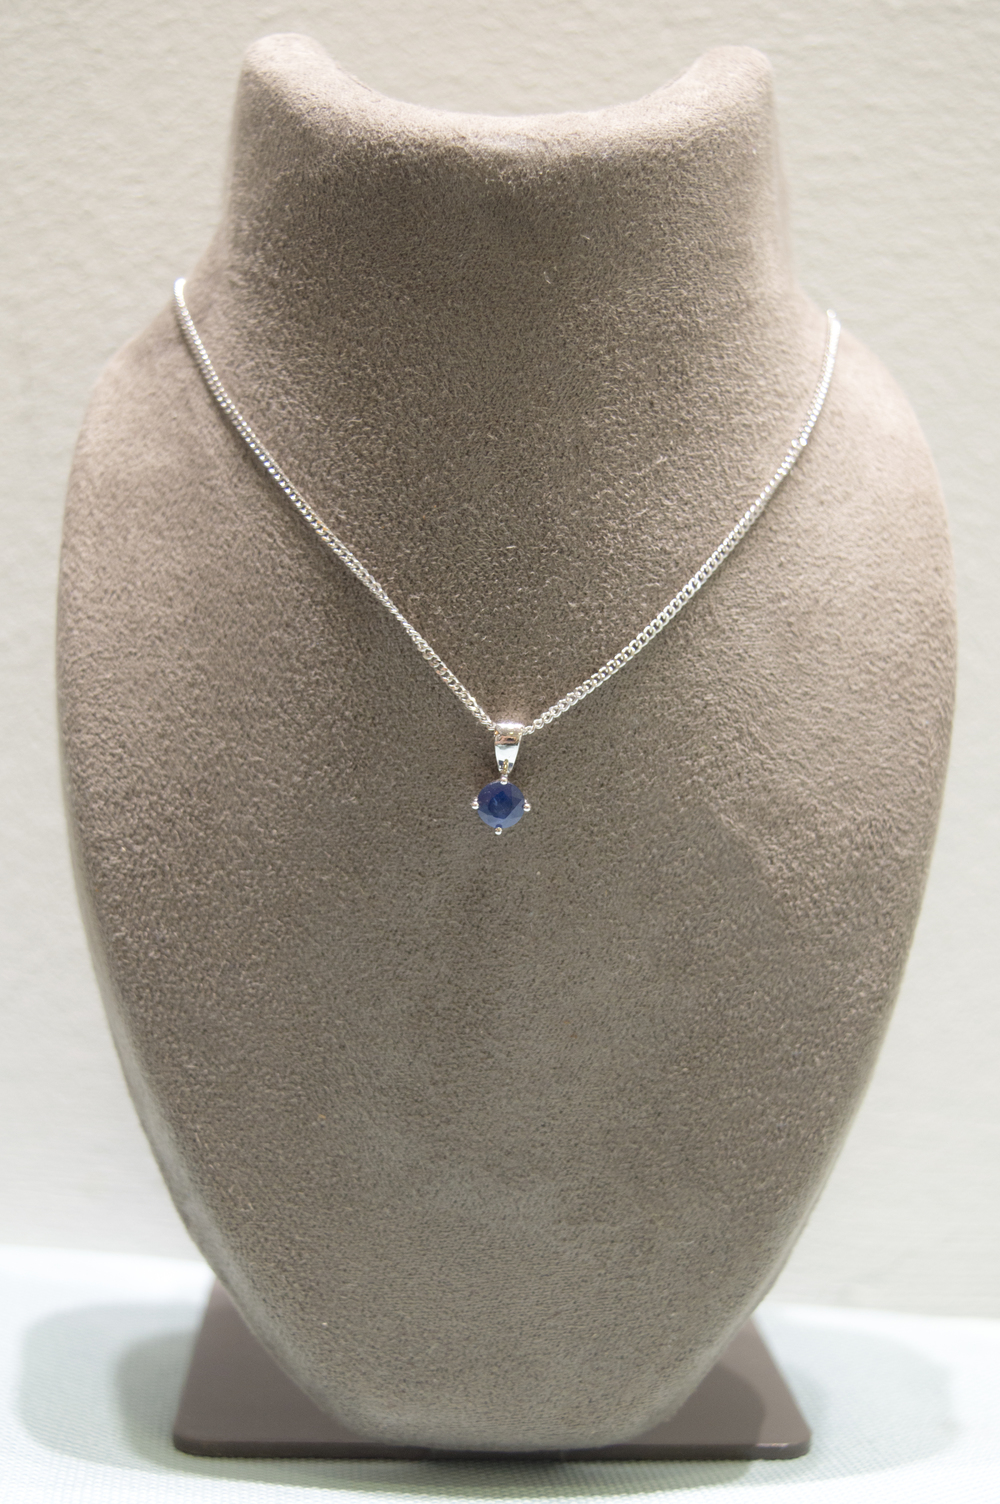 £230 - Sapphire 9ct White Gold Pendant